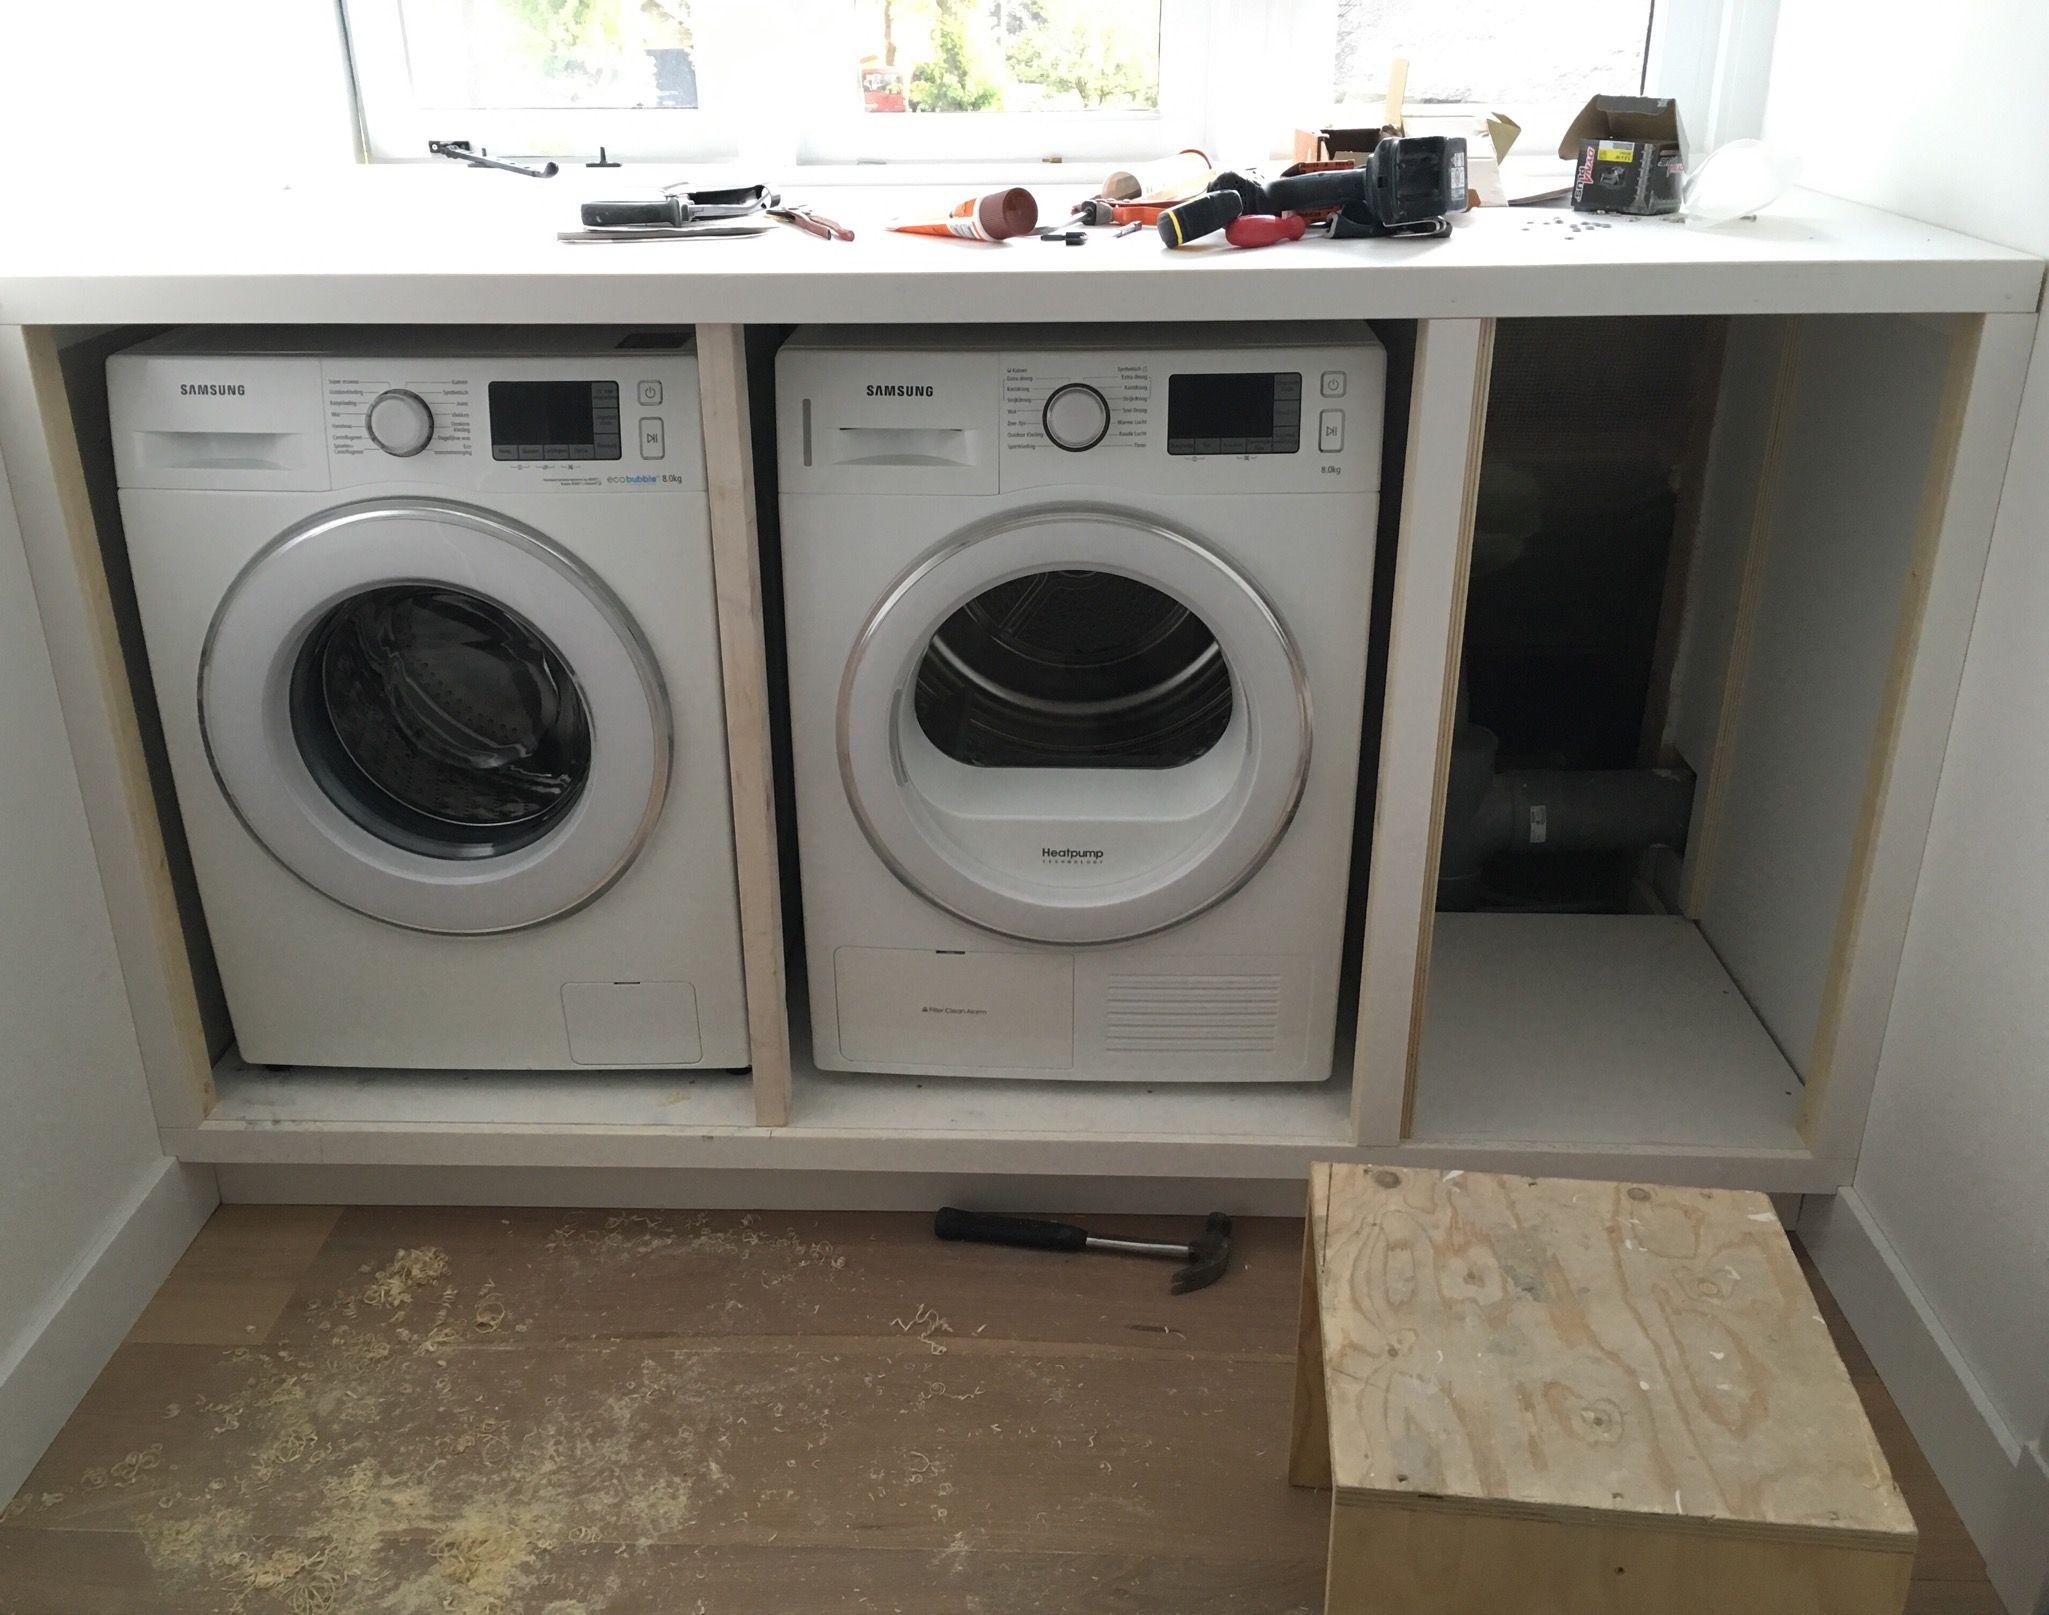 wasmachine ombouw - Badkamer | Pinterest - Zolder, Kelder en Badkamer